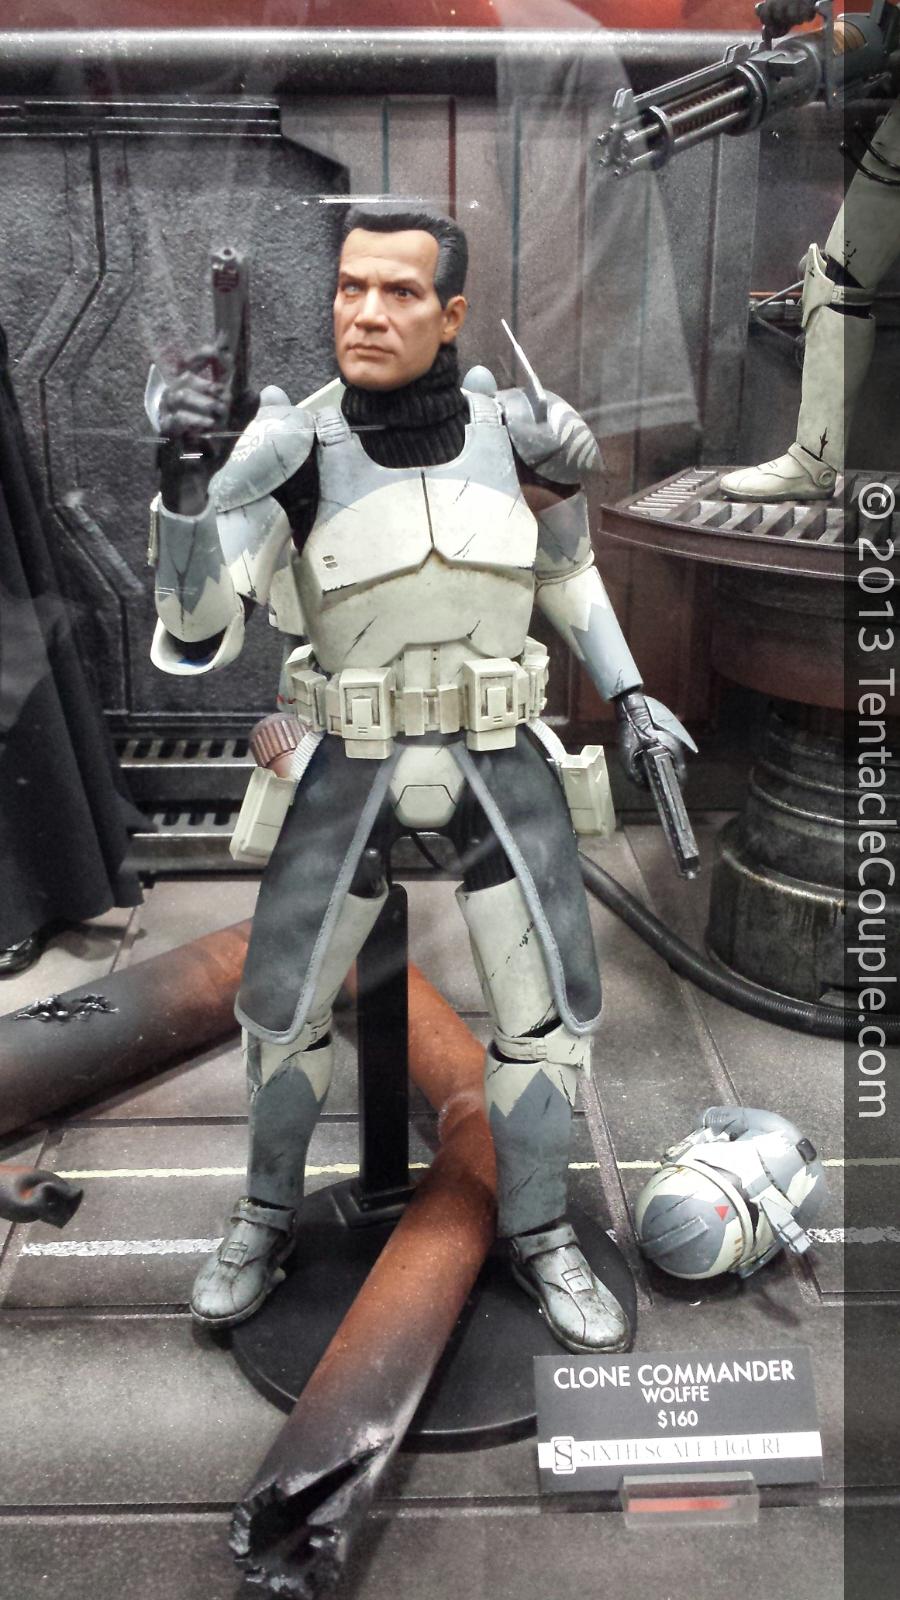 San Diego Comic-Con 2013 - Star Wars Commander